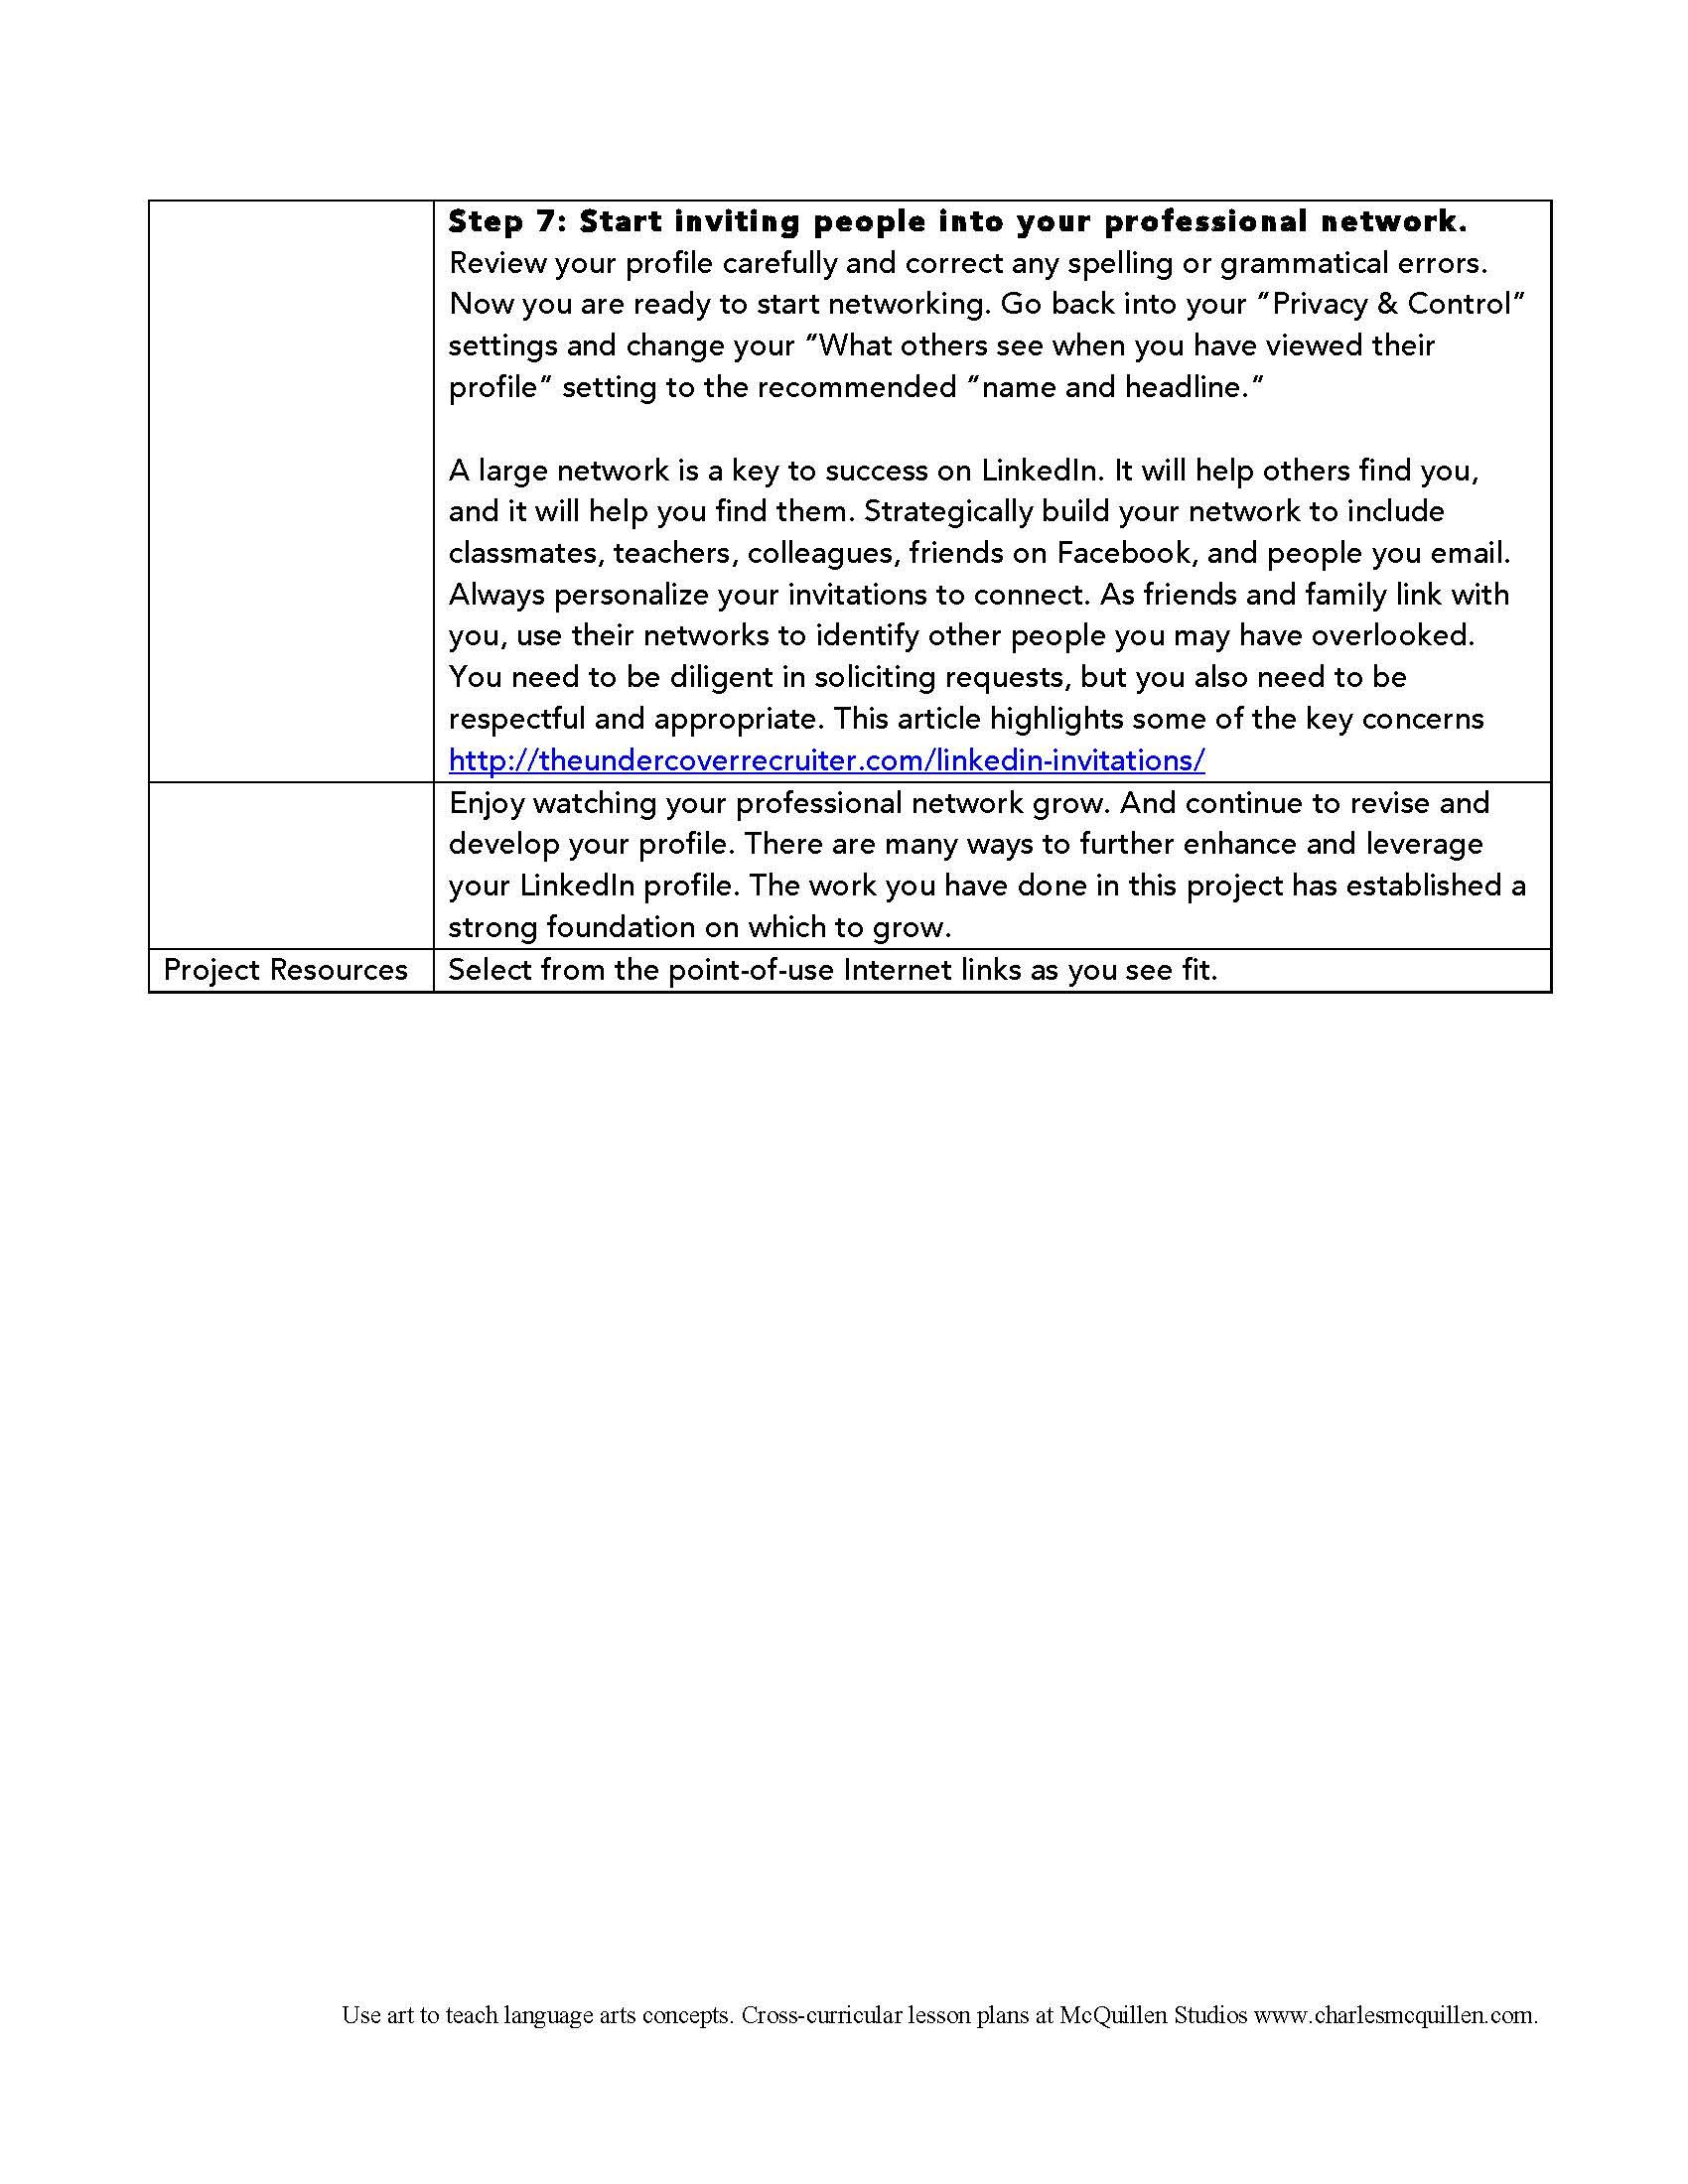 LinkedIn Profile Assignement 3